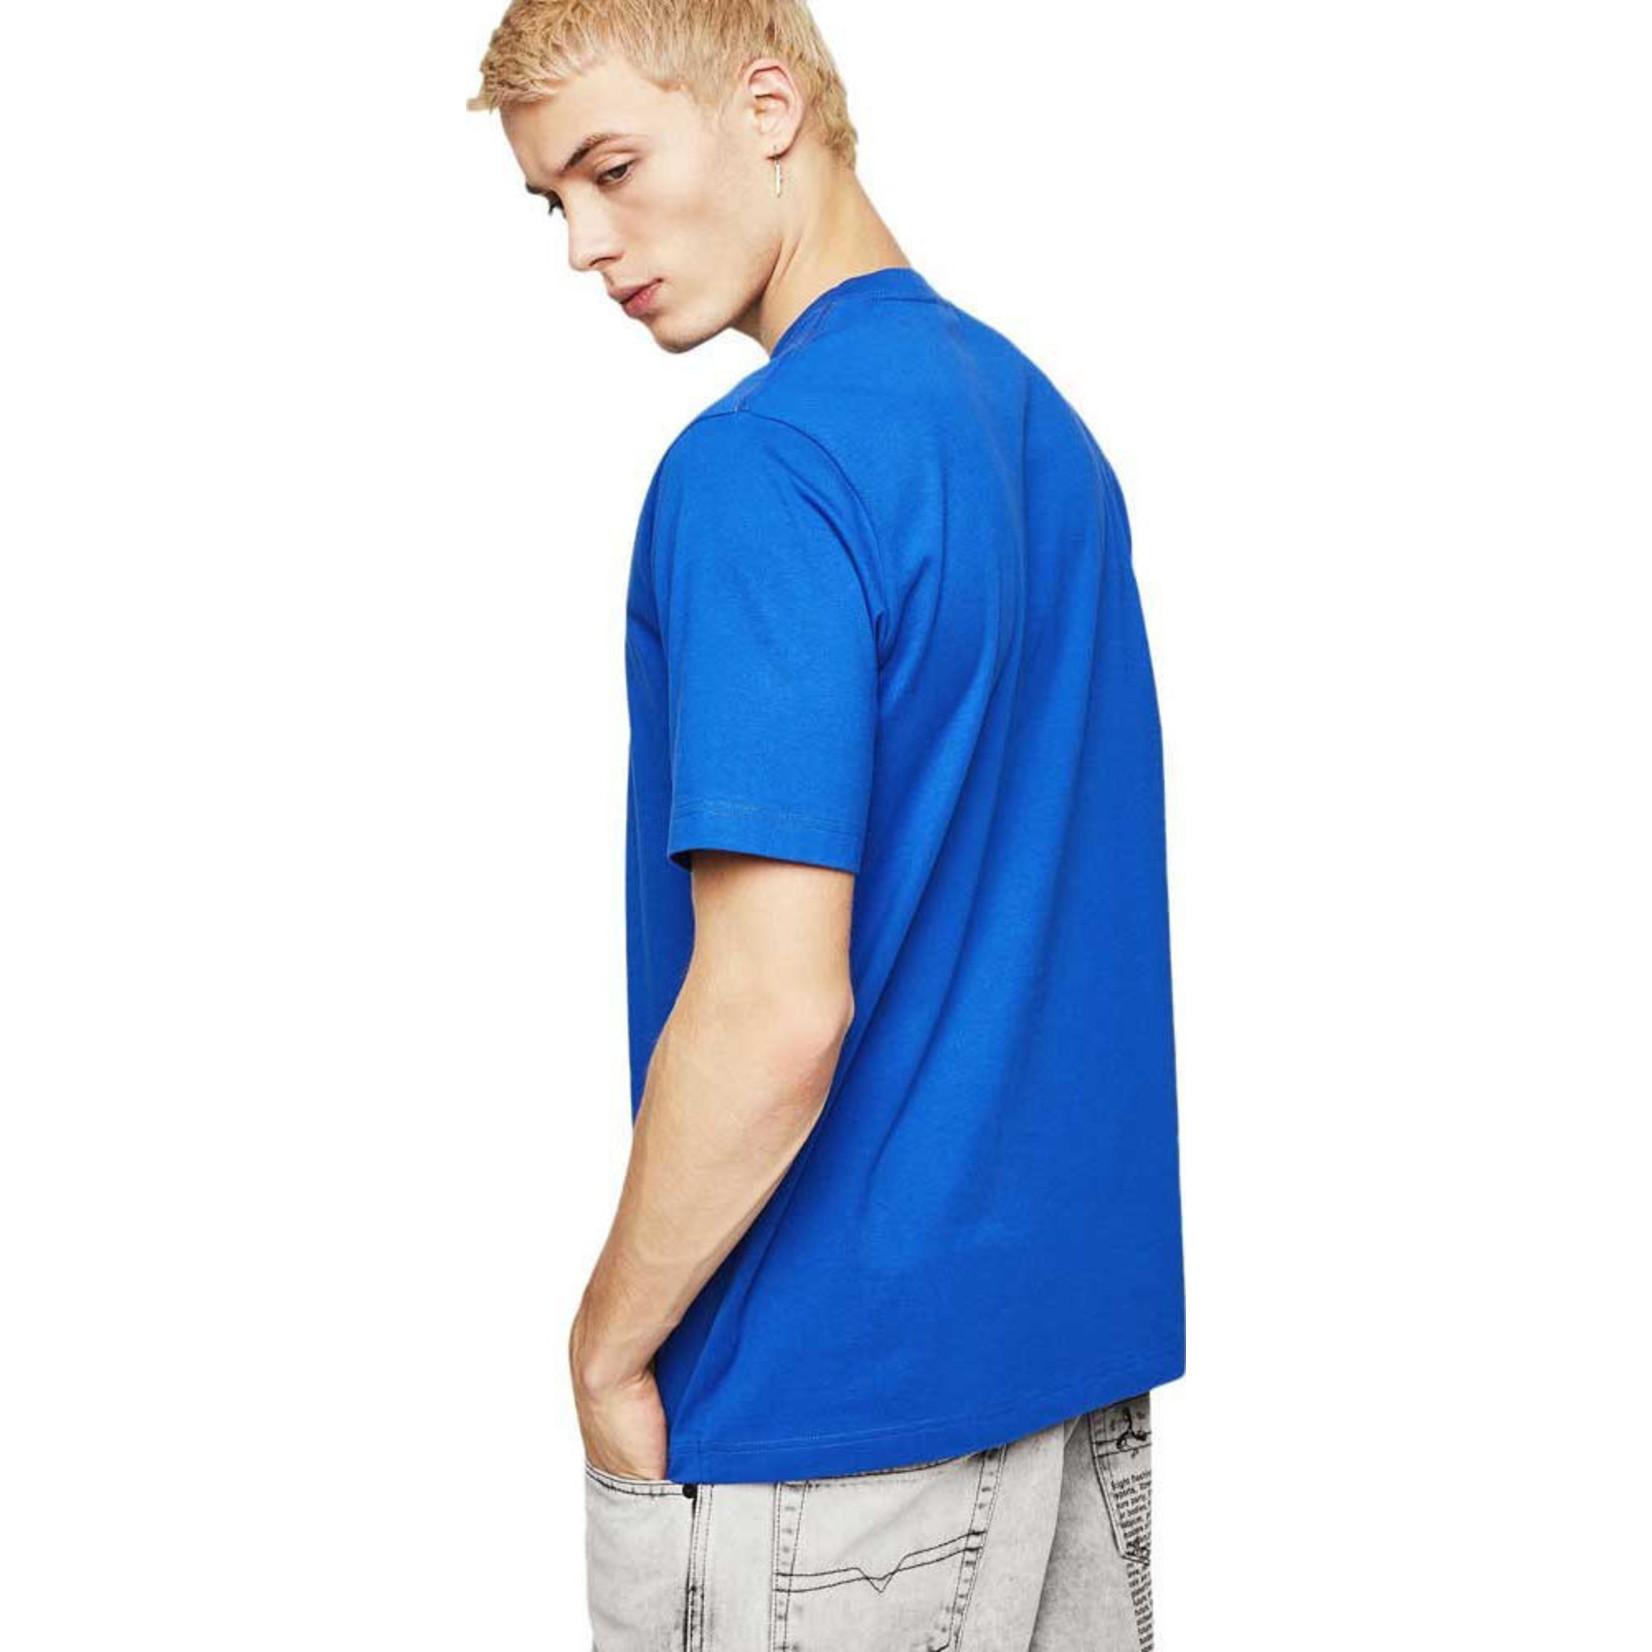 DIESEL DIESEL T-SHIRT T-JUST A9 - BLUE